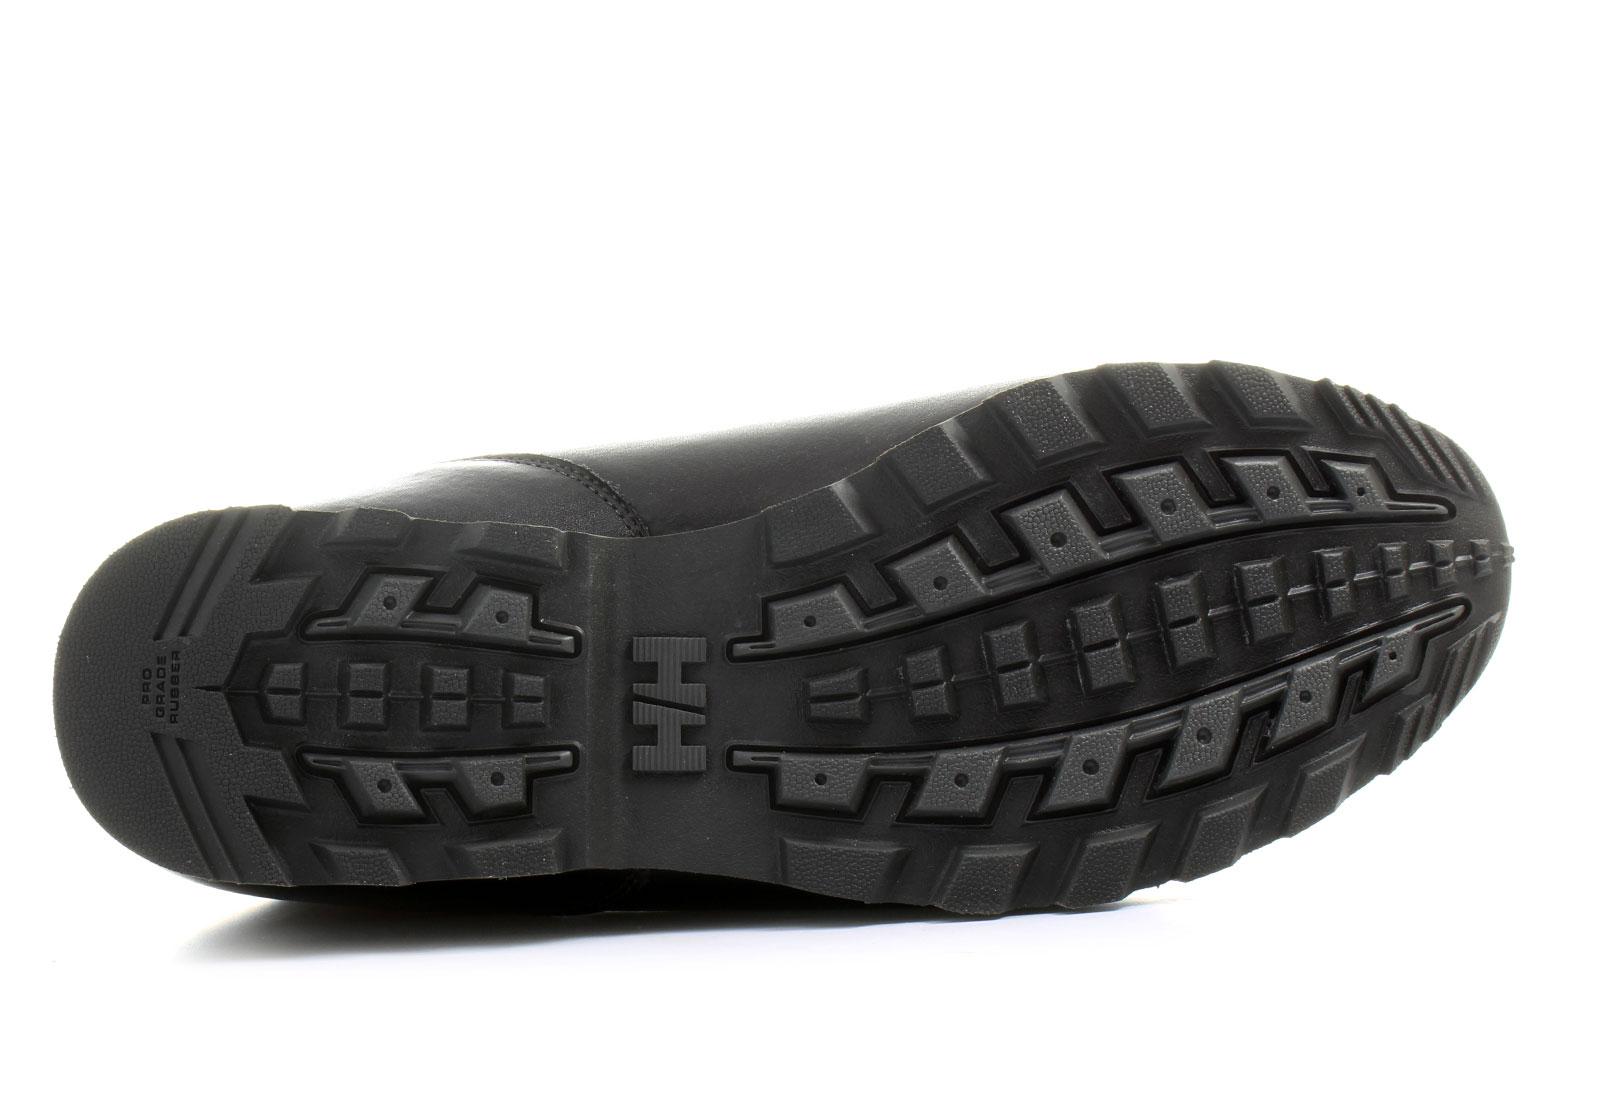 d8dfe3d15b3f Helly Hansen Bakancs - The Forester - 10513-996 - Office Shoes ...